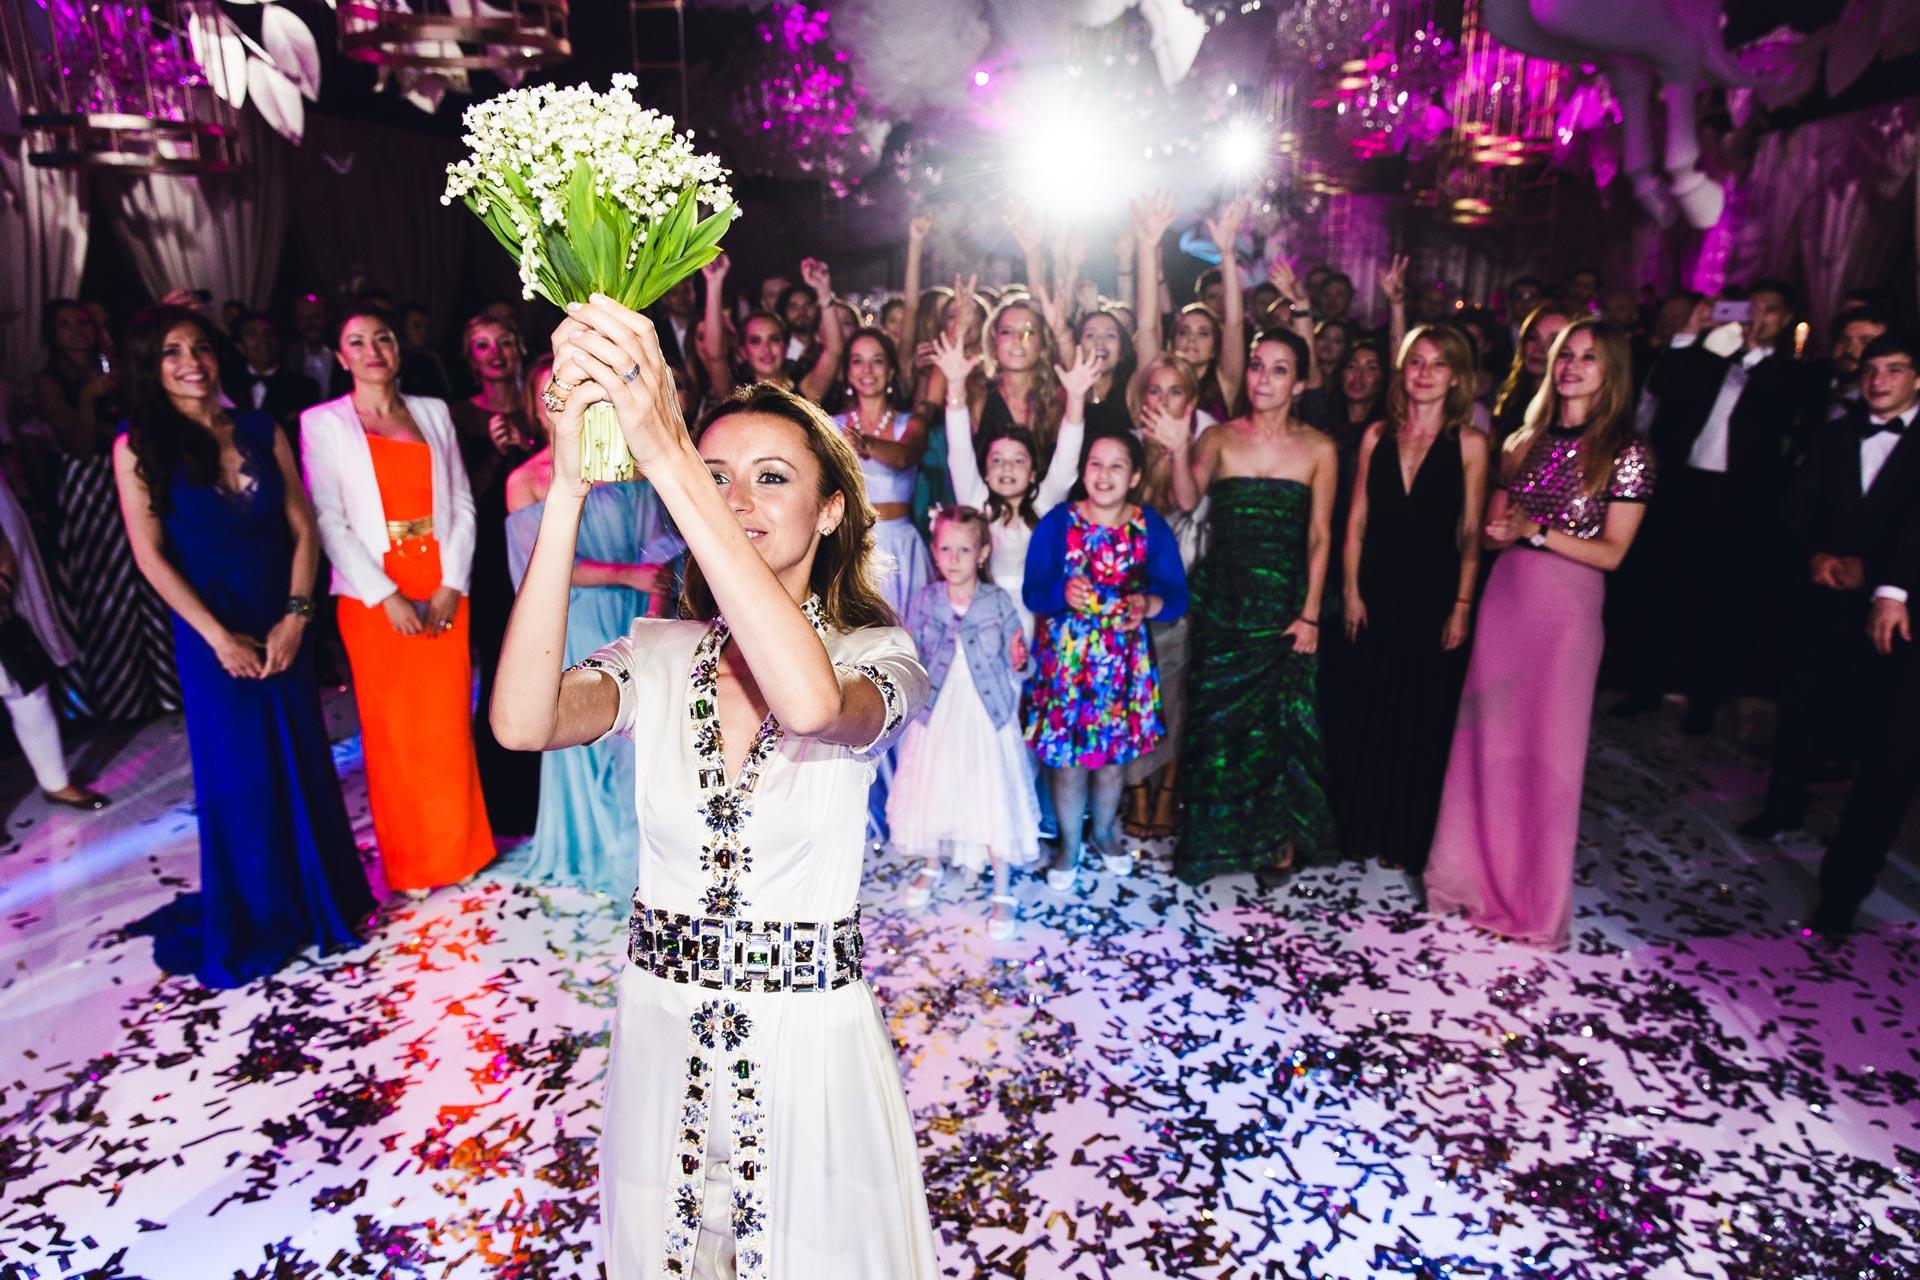 Follow me to. Свадьба Натальи и Мурада Османн фото 10